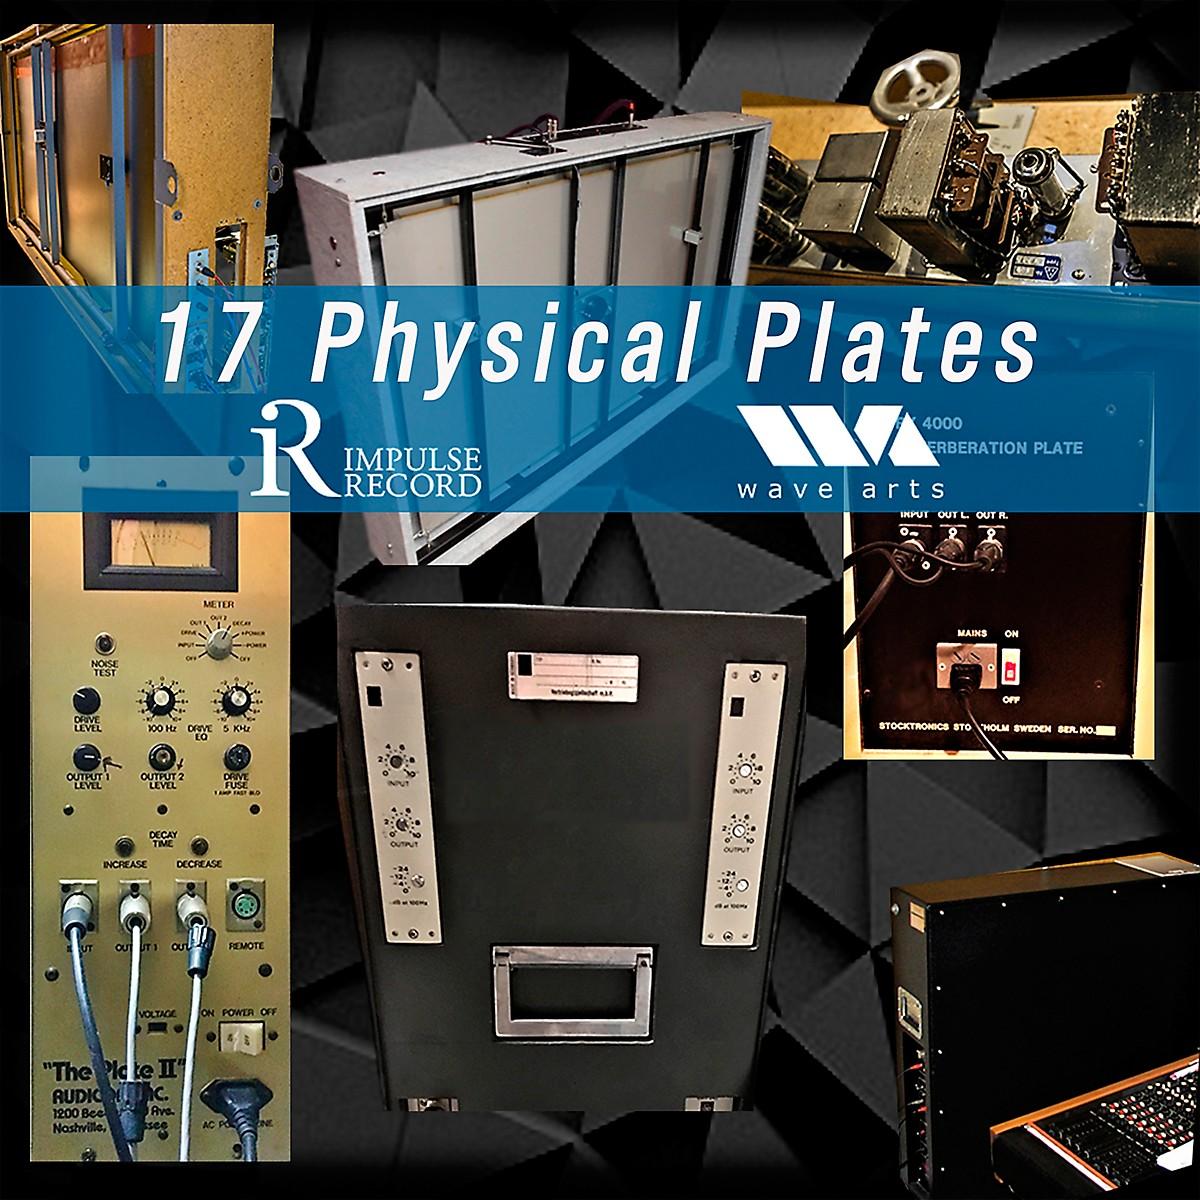 Impulse Record 17 Physical Plates